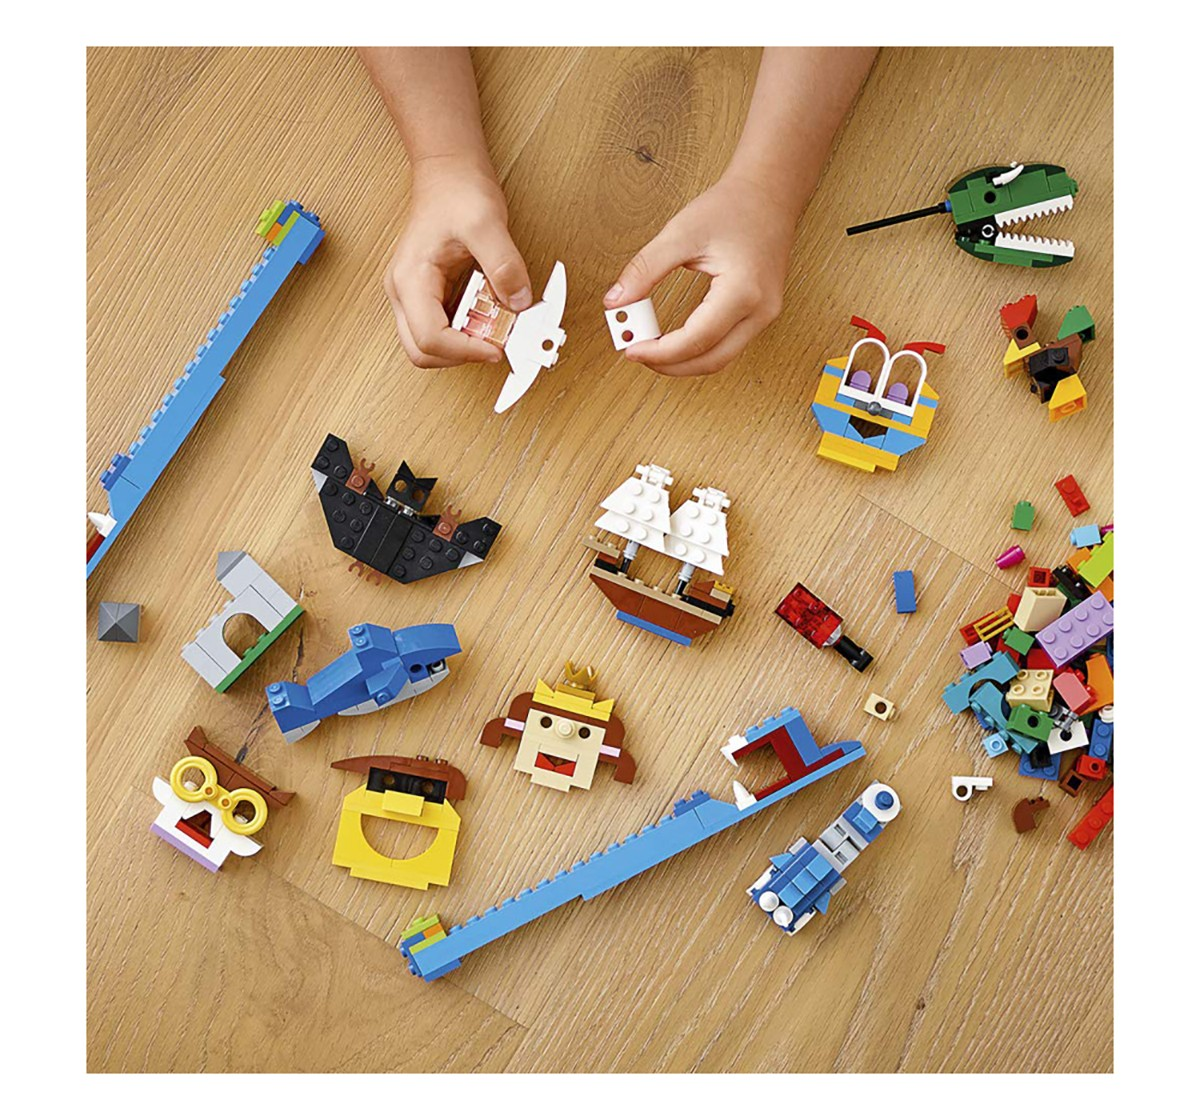 Lego 11009 Bricks And Lights Blocks for Kids age 5Y+